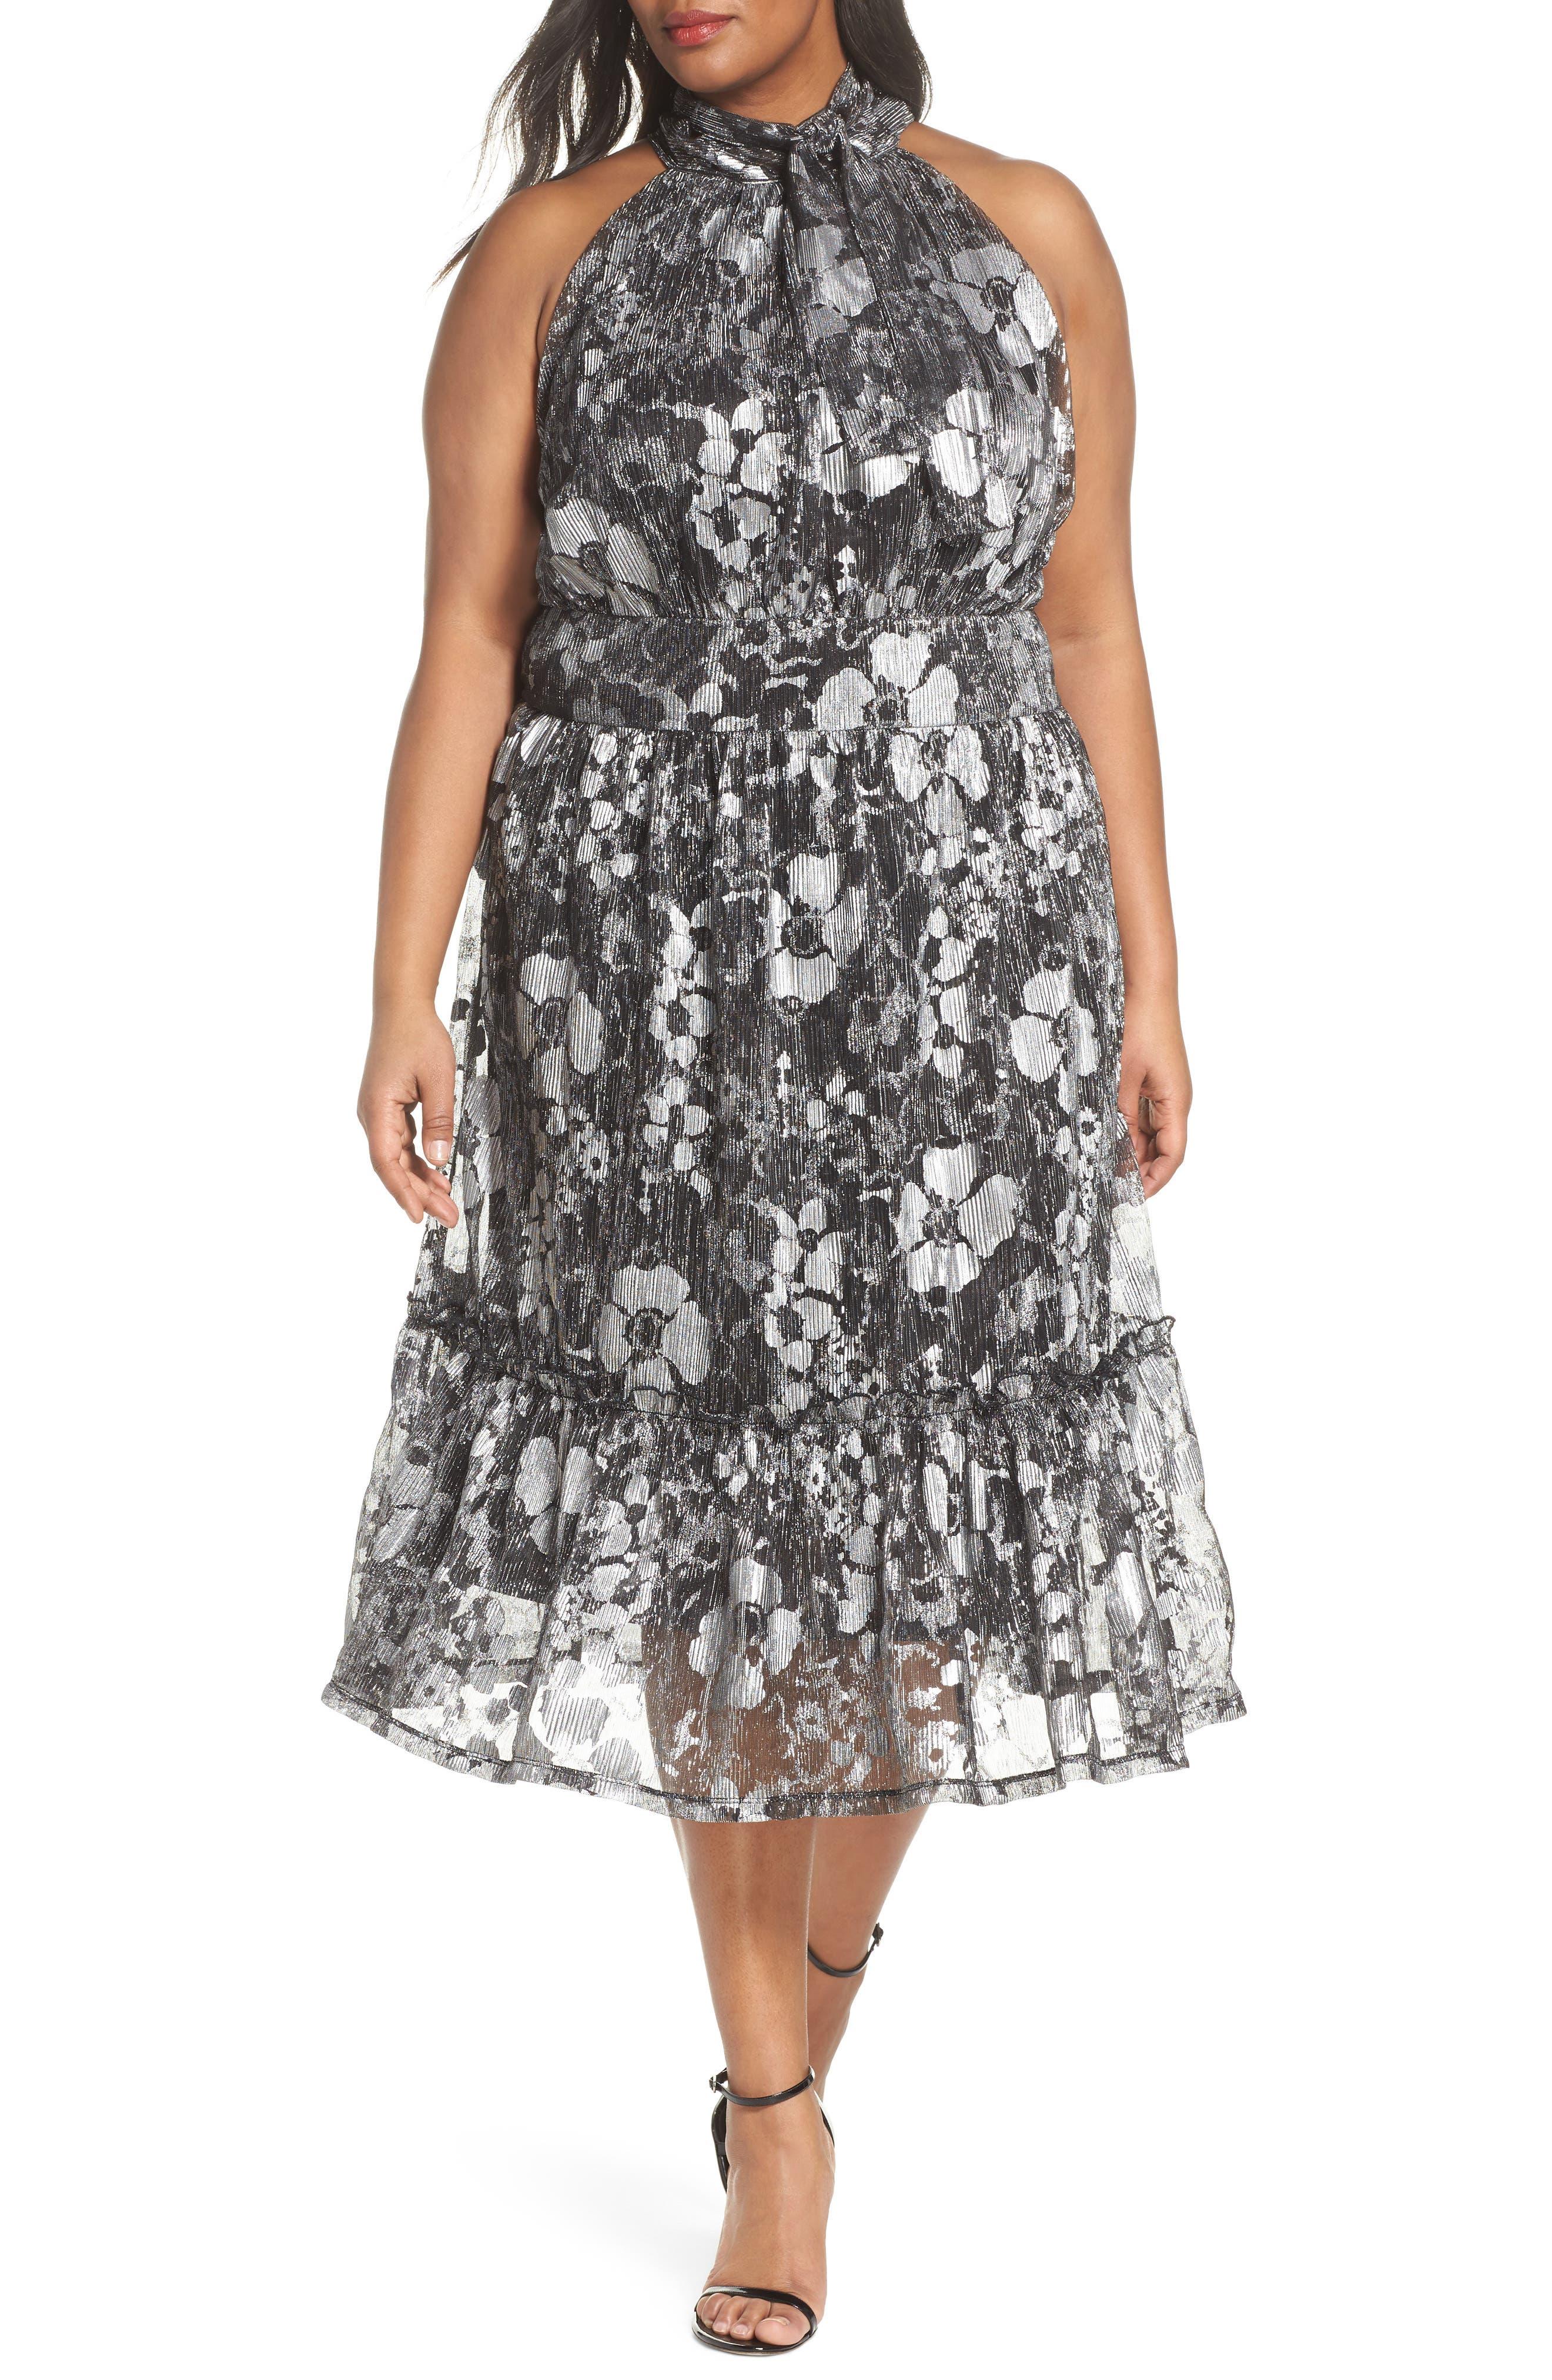 Floral Metallic Midi Dress,                             Main thumbnail 1, color,                             Black/ Silver Foil